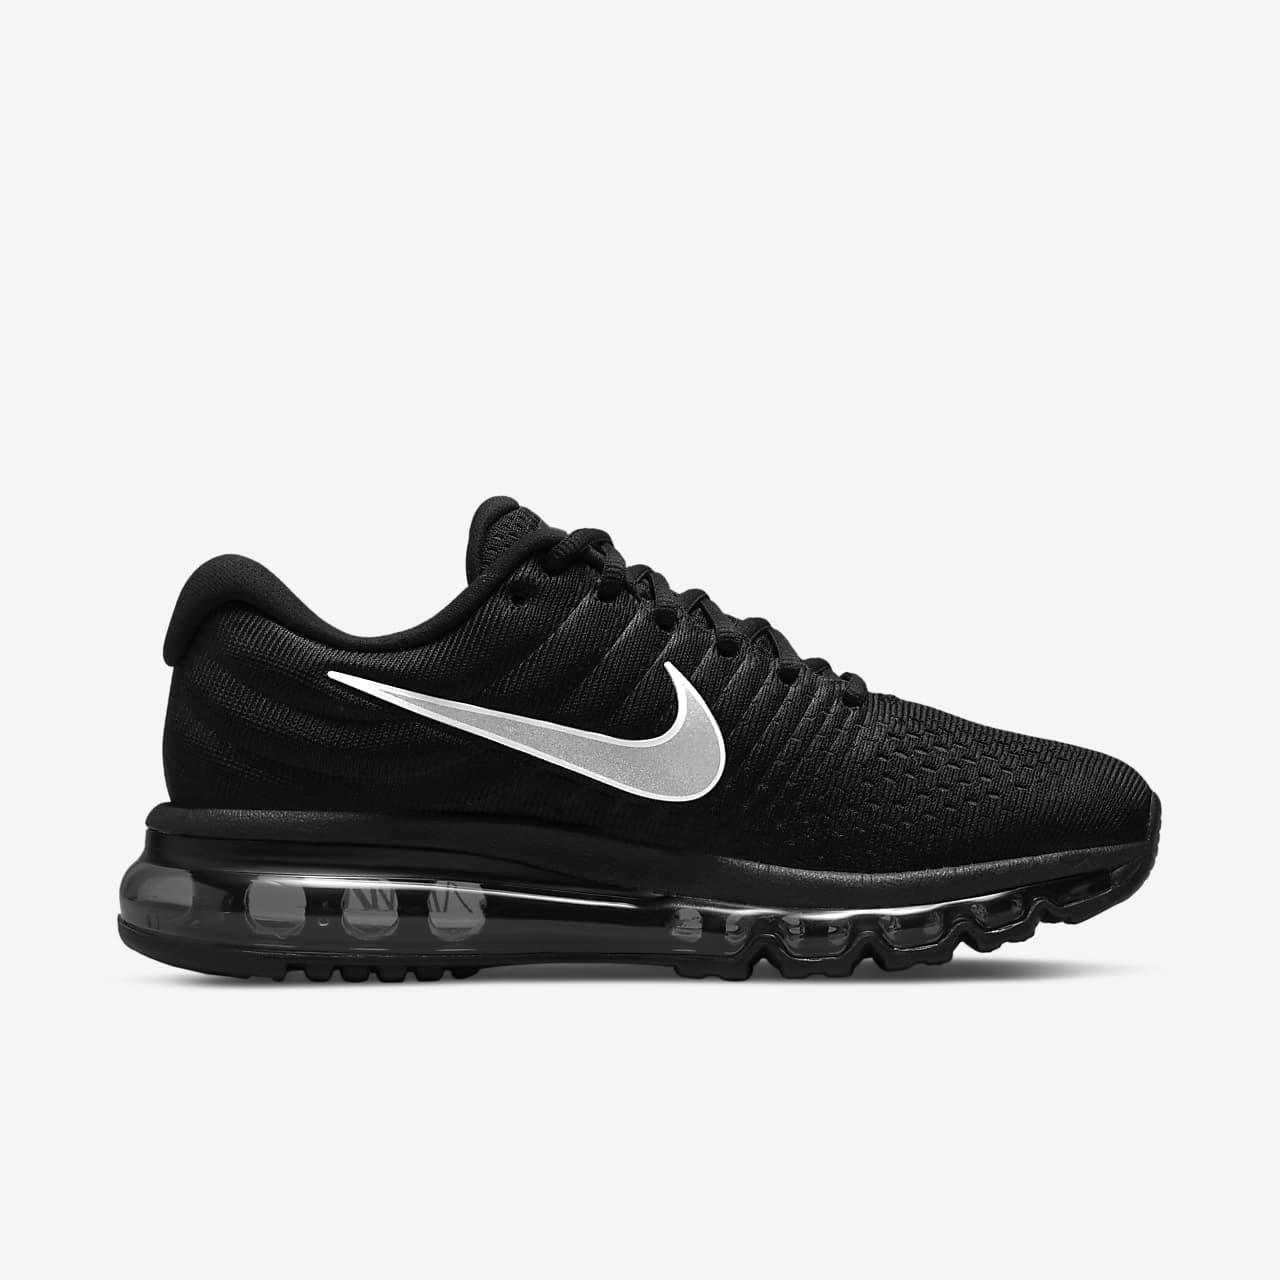 sports shoes 367a2 a24ef Chaussure Nike Air Max 2017 pour Femme. Nike.com FR